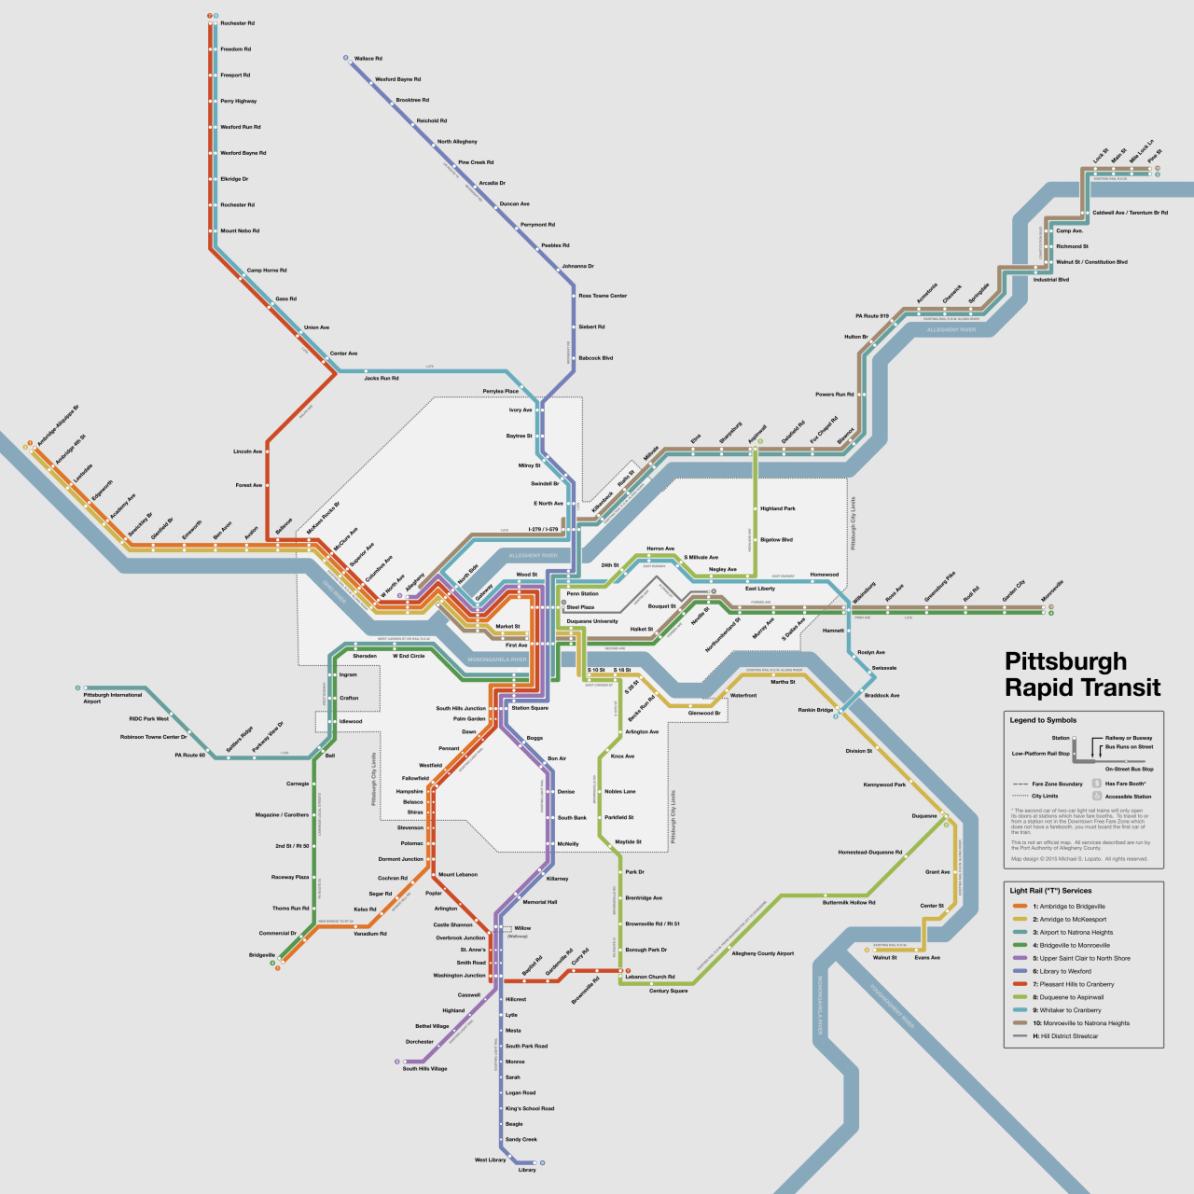 Pittaburgh Subway Map.Transit Maps Submission Fantasy Future Map Pittsburgh Rapid